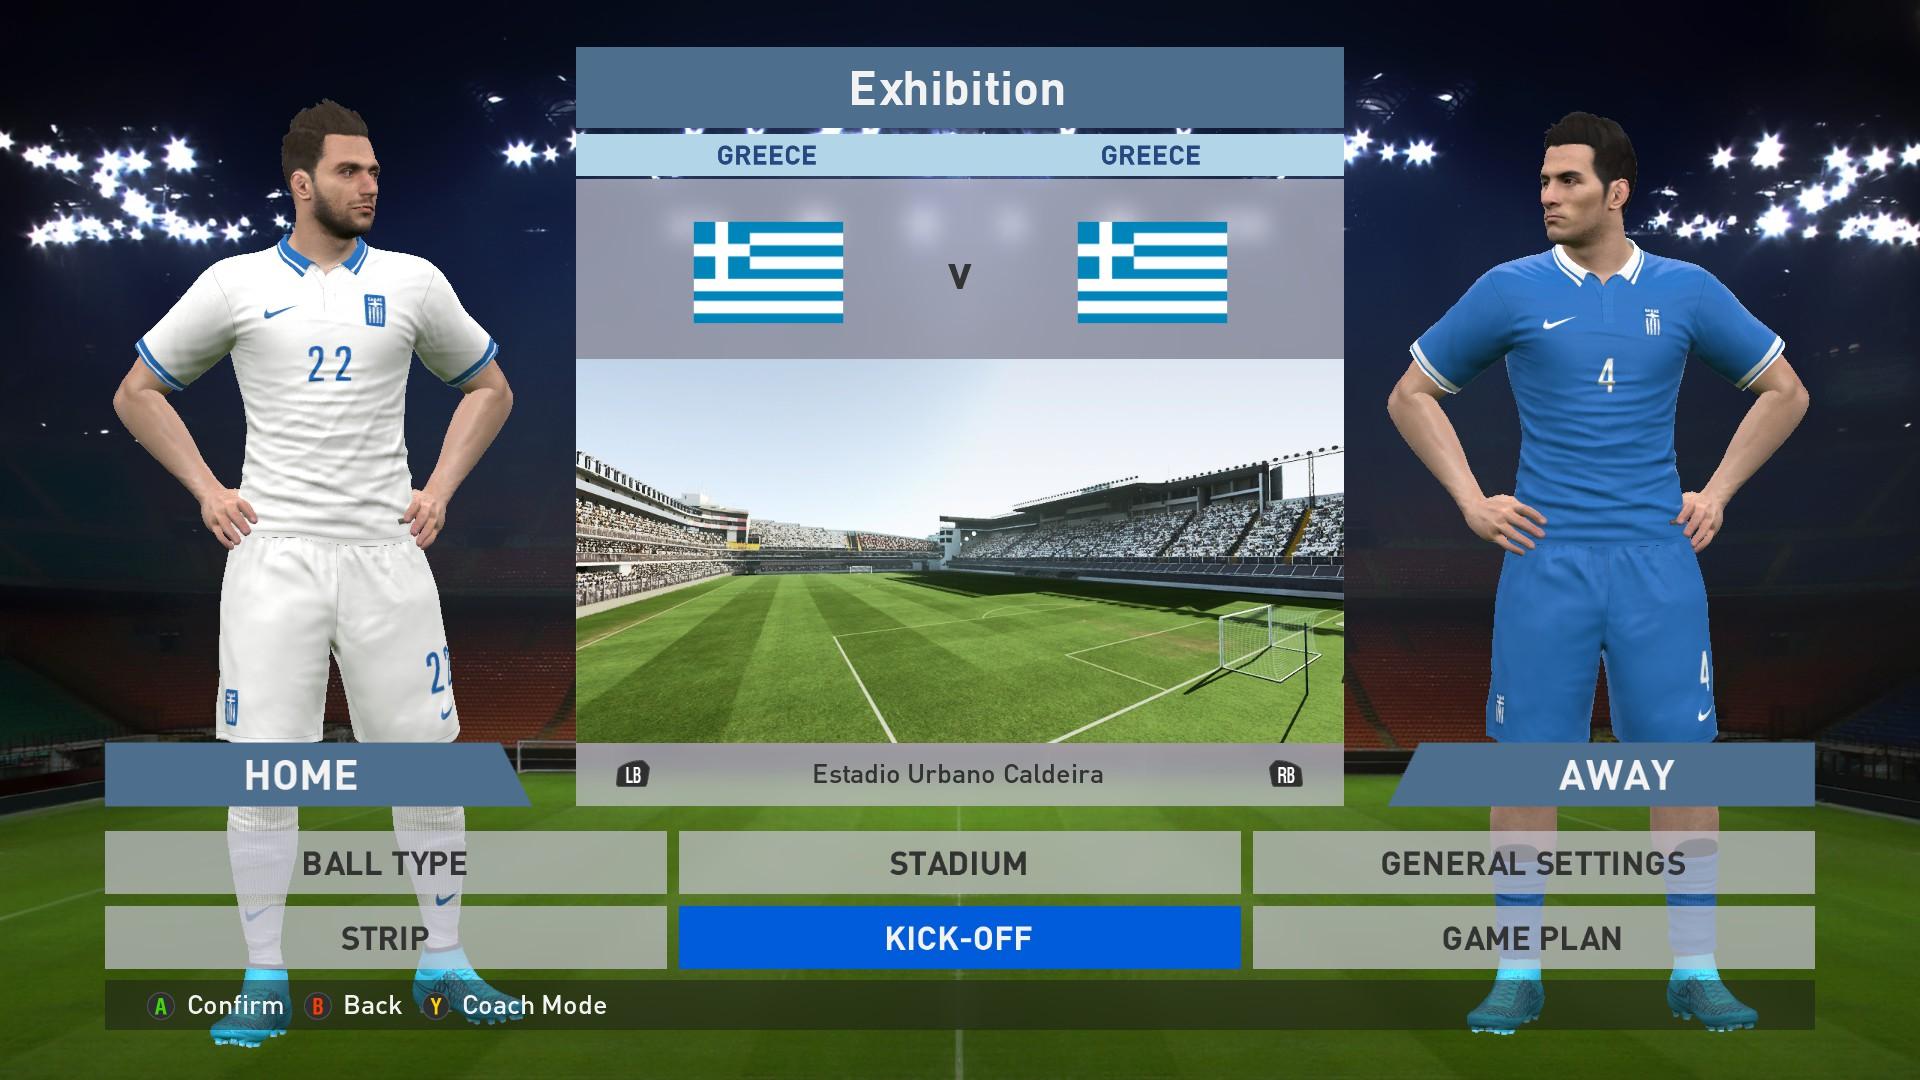 f0a6ec90b23 Greece National team Home Away kits image -  PES-16  Megaforce teams ...